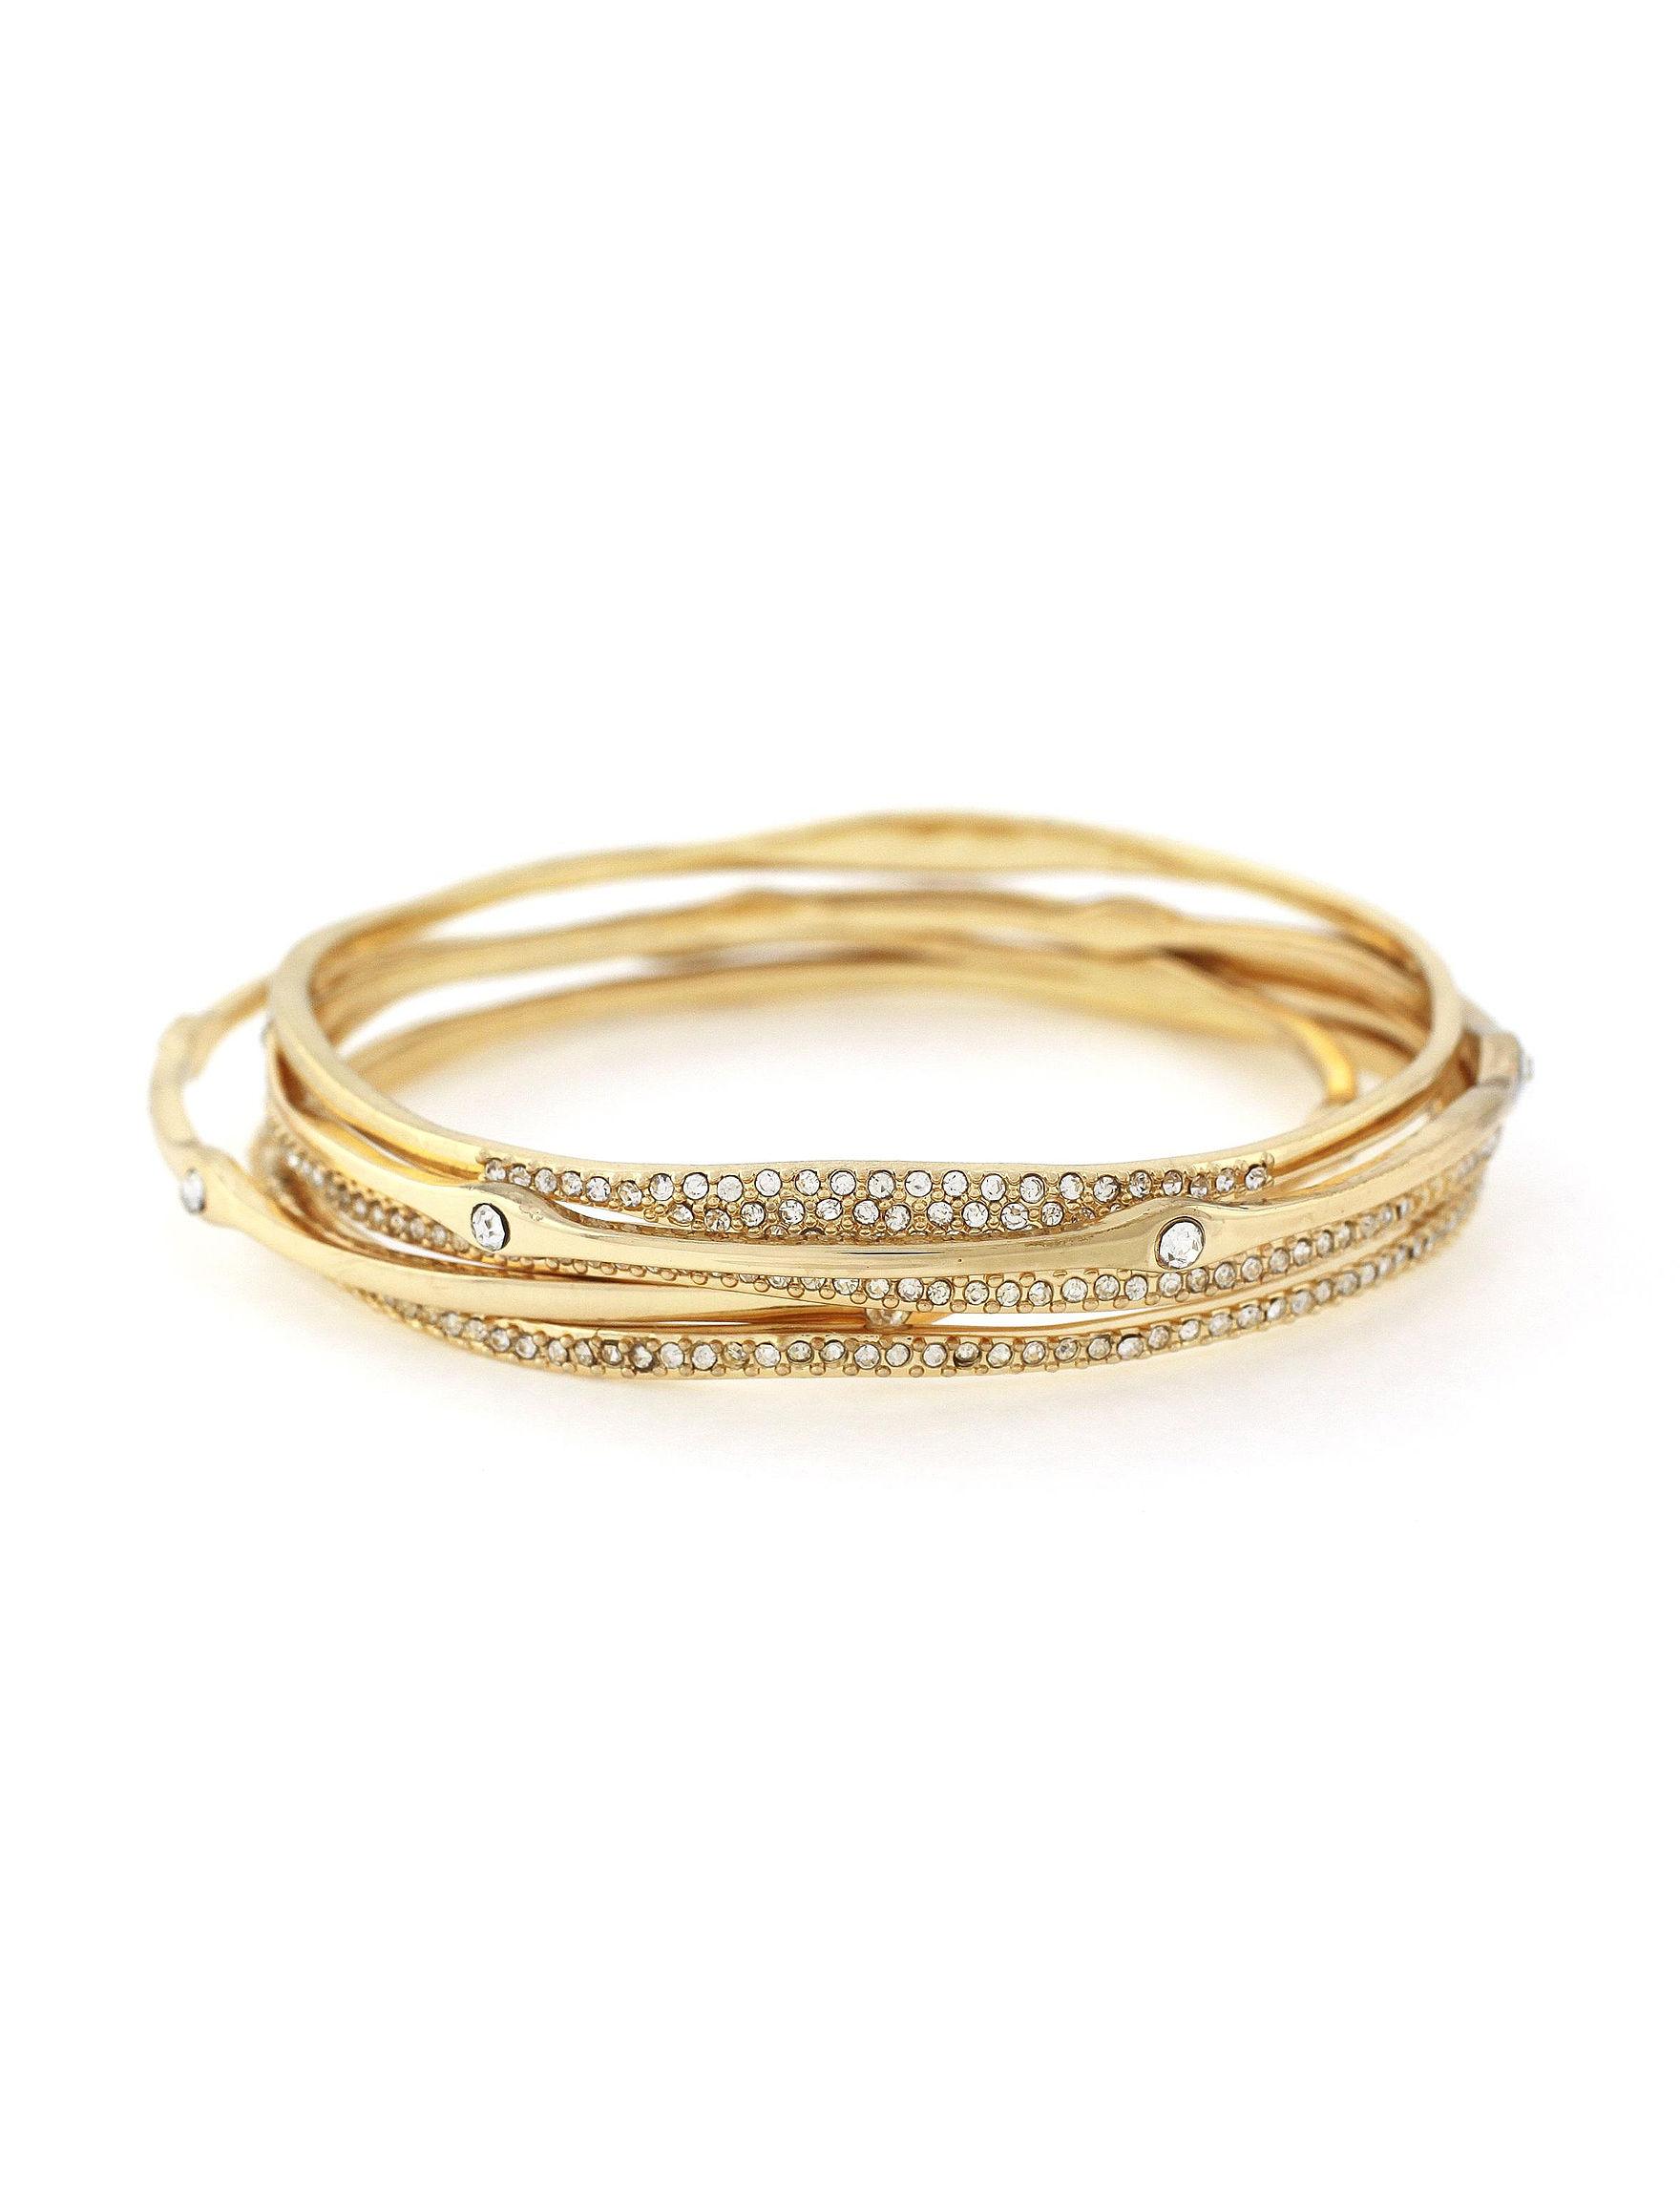 Jessica Simpson Gold Fashion Jewelry